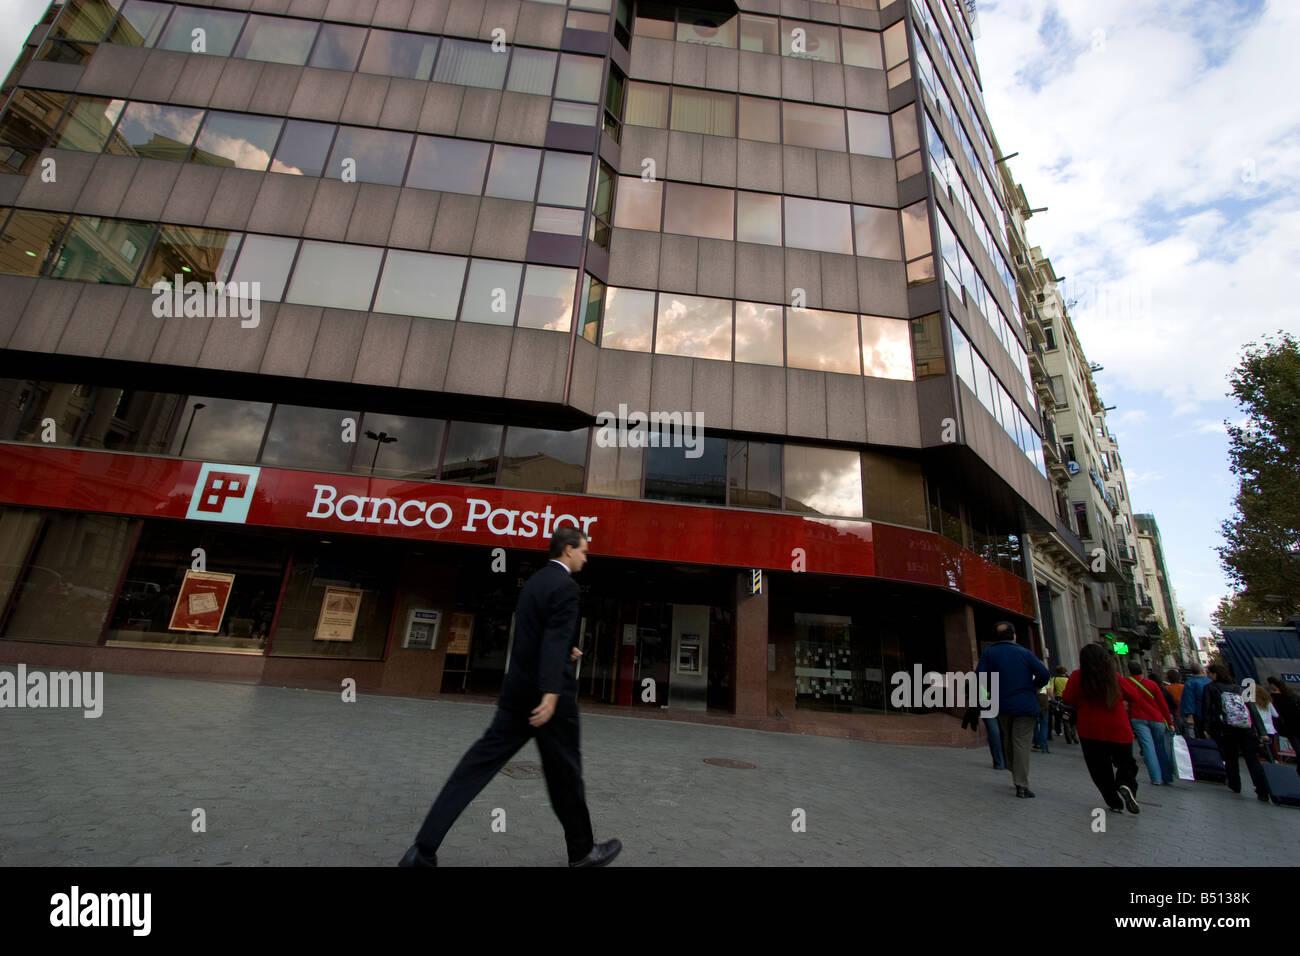 Banco Pastor Niederlassung barcelona Stockbild